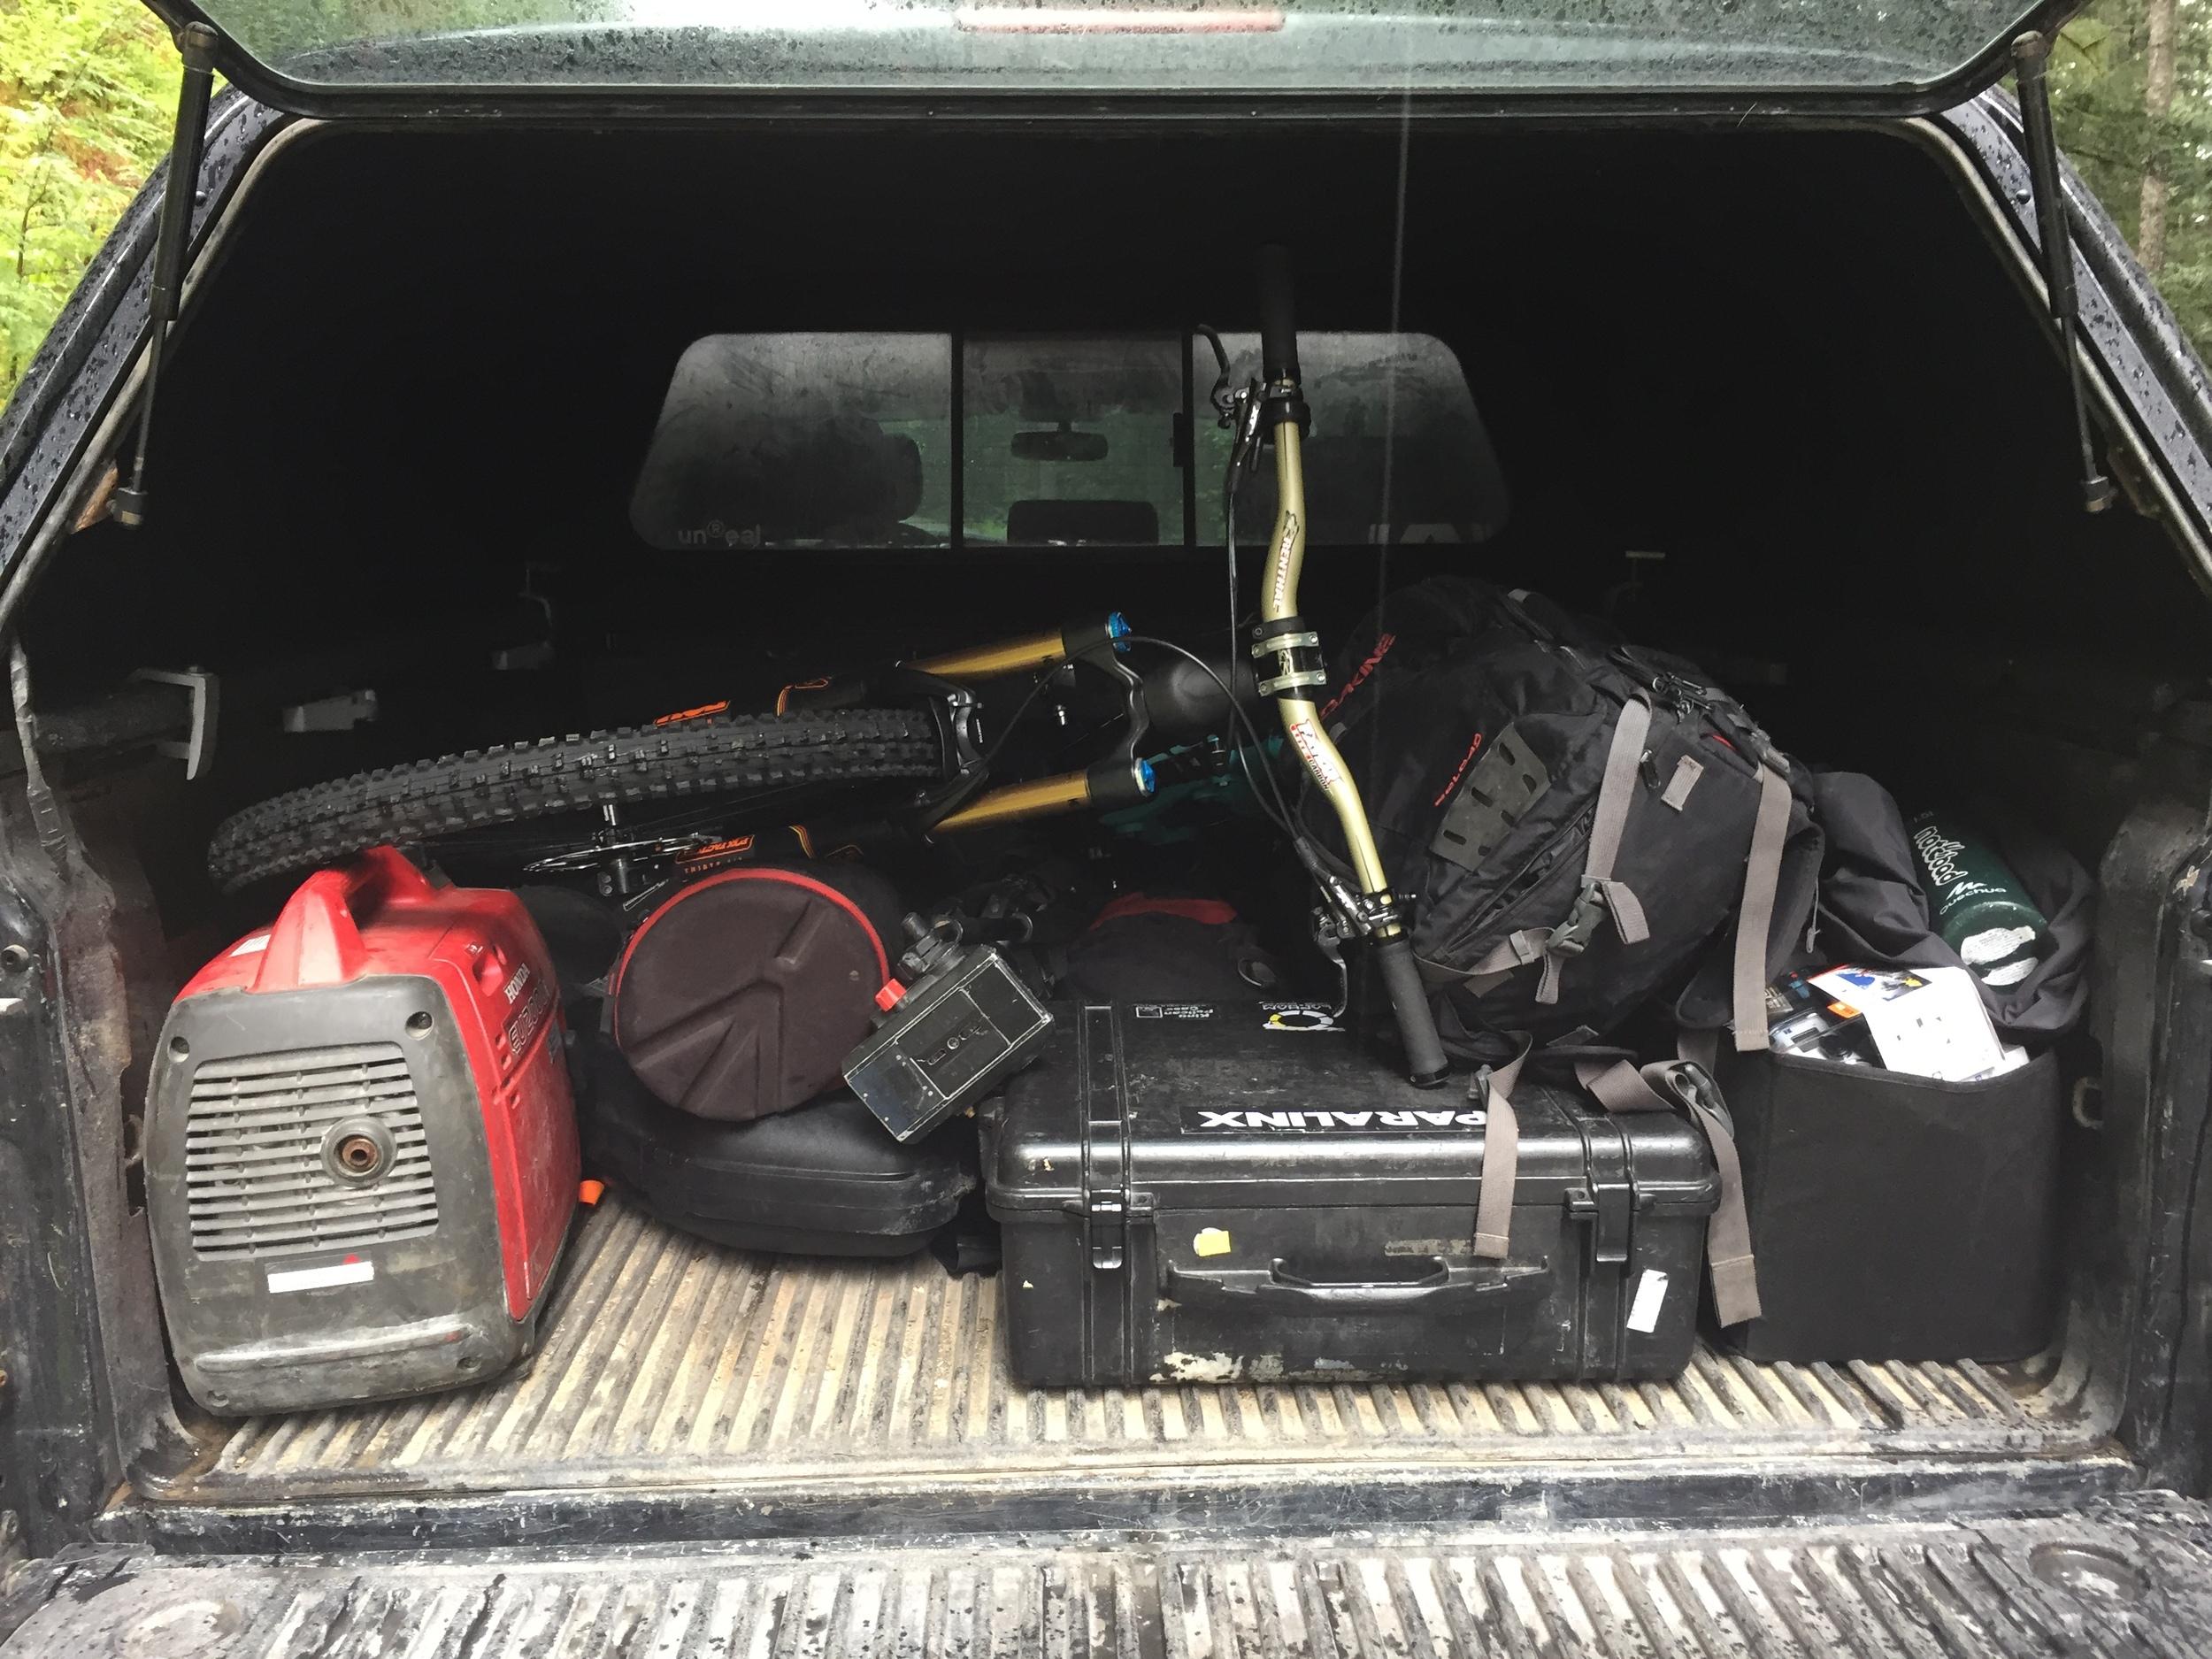 Truck full of gear.